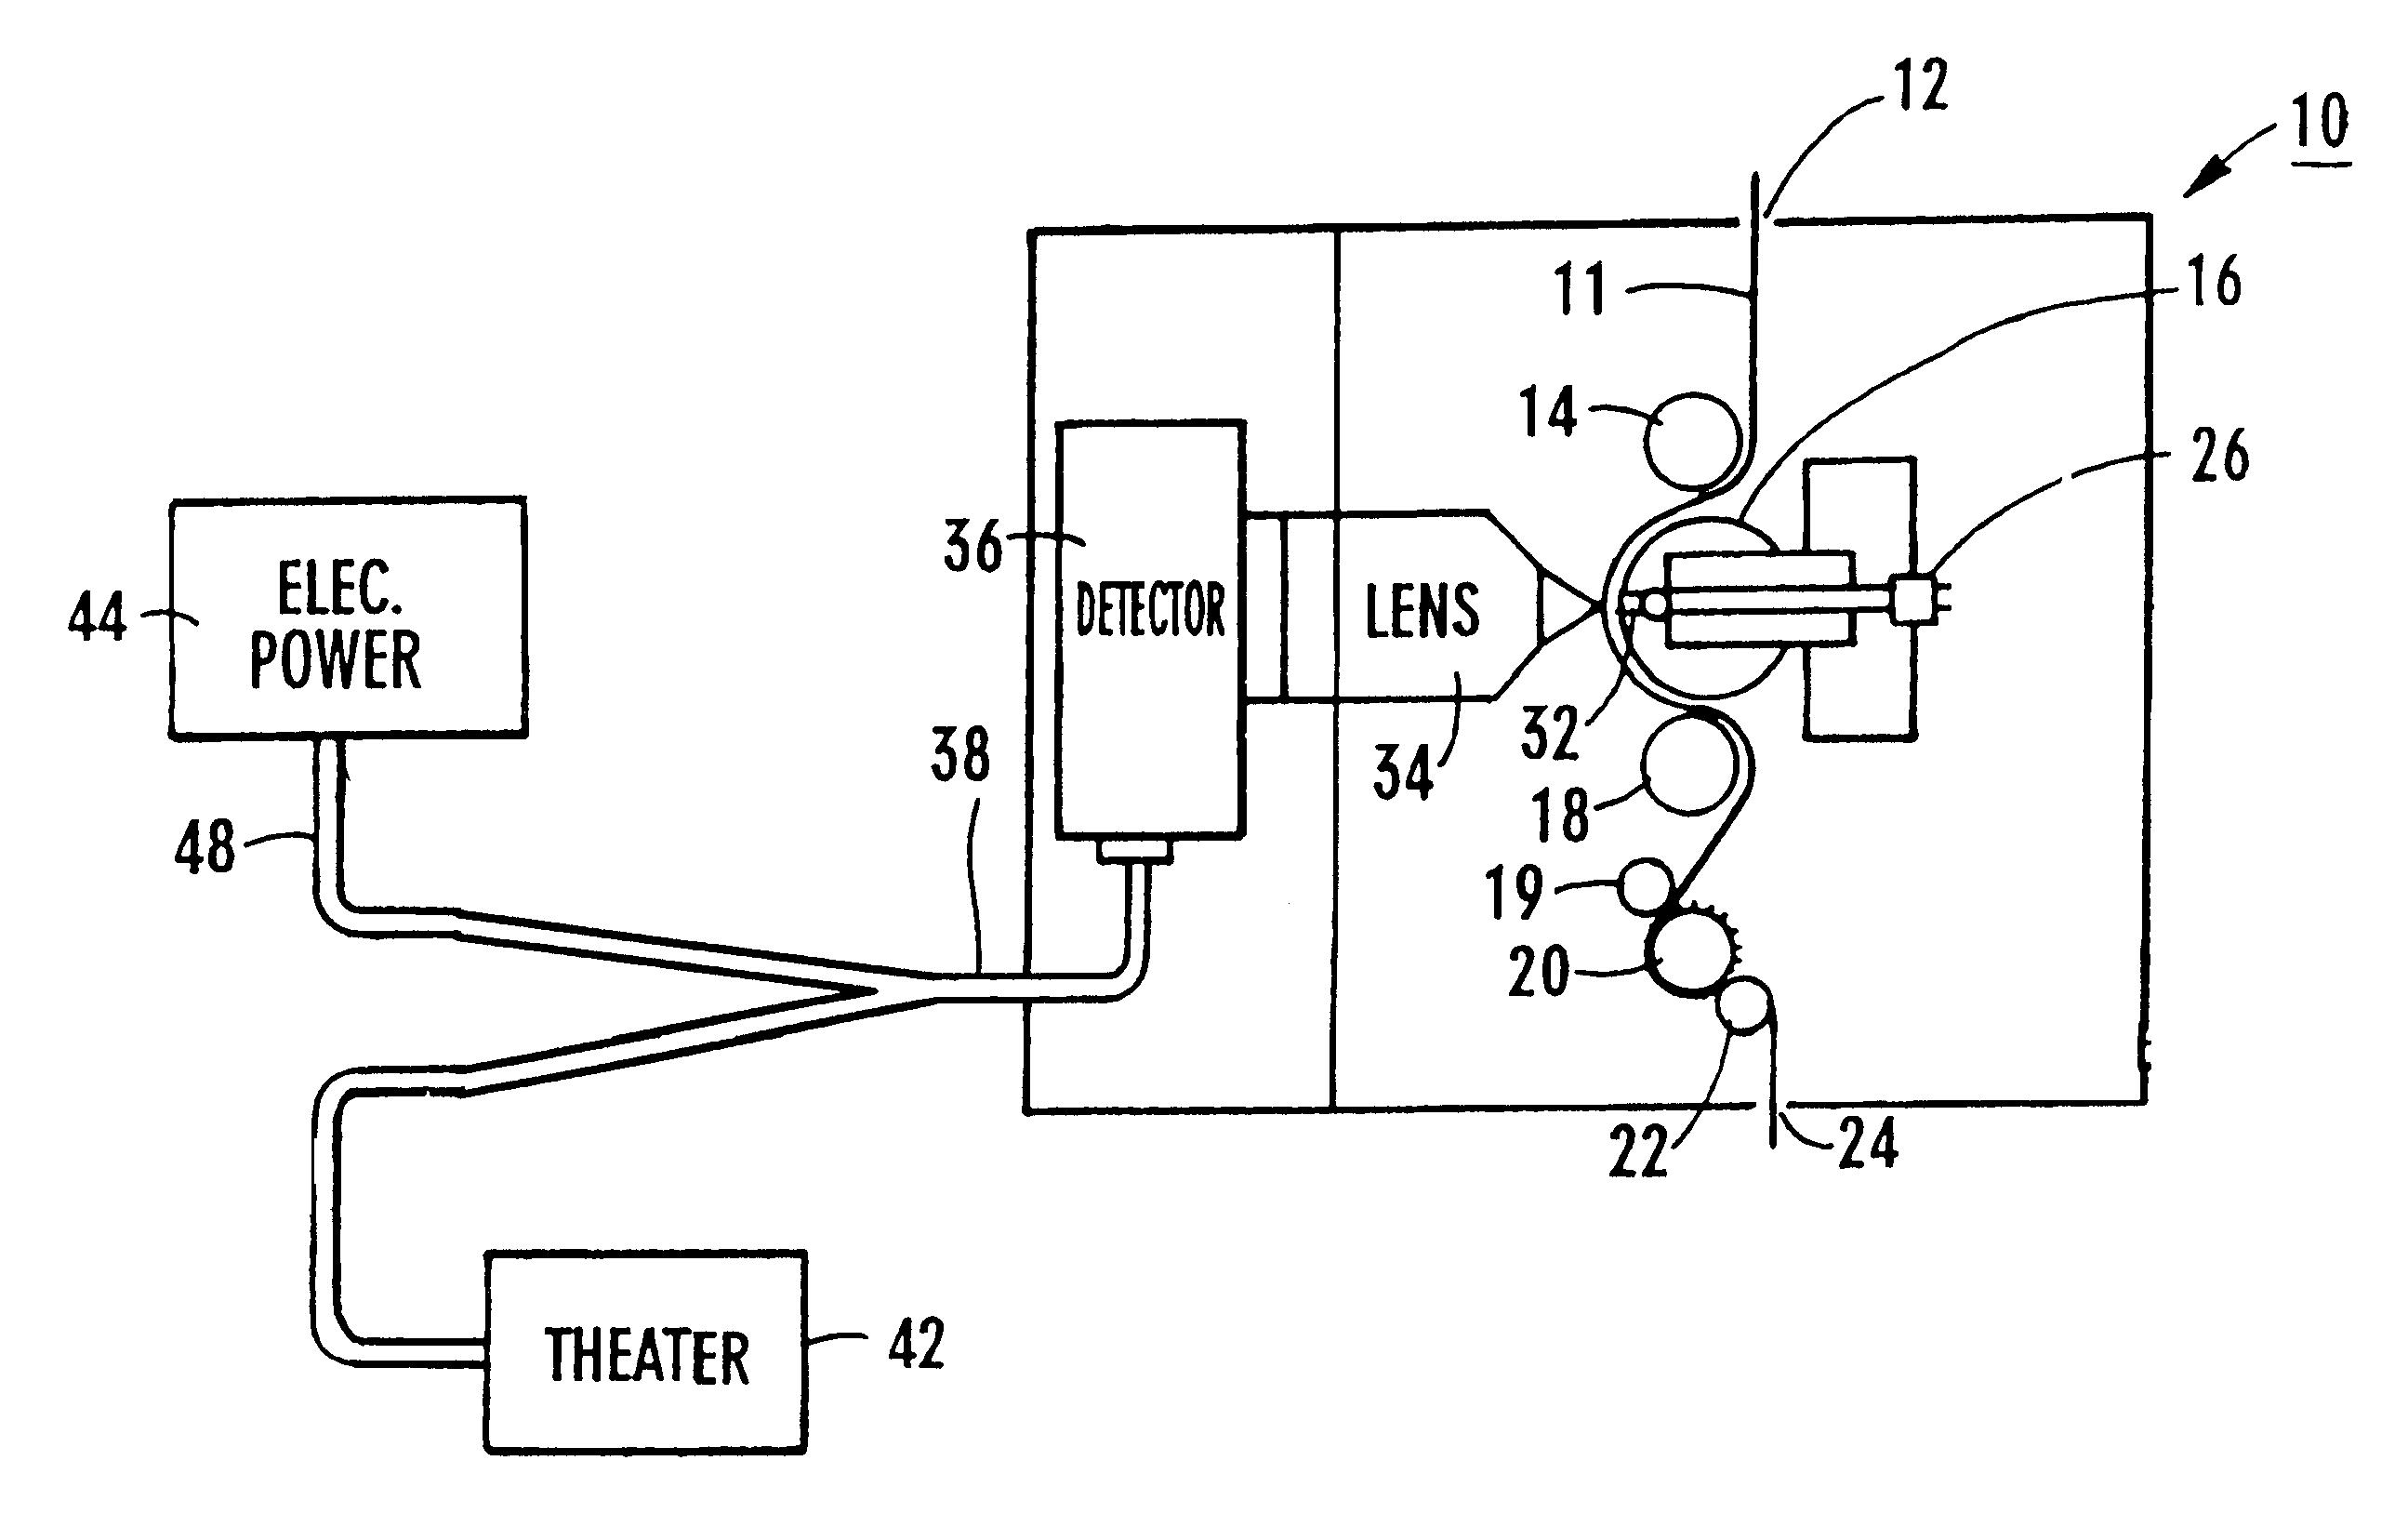 patent us6351302 - analog sound track digitizer